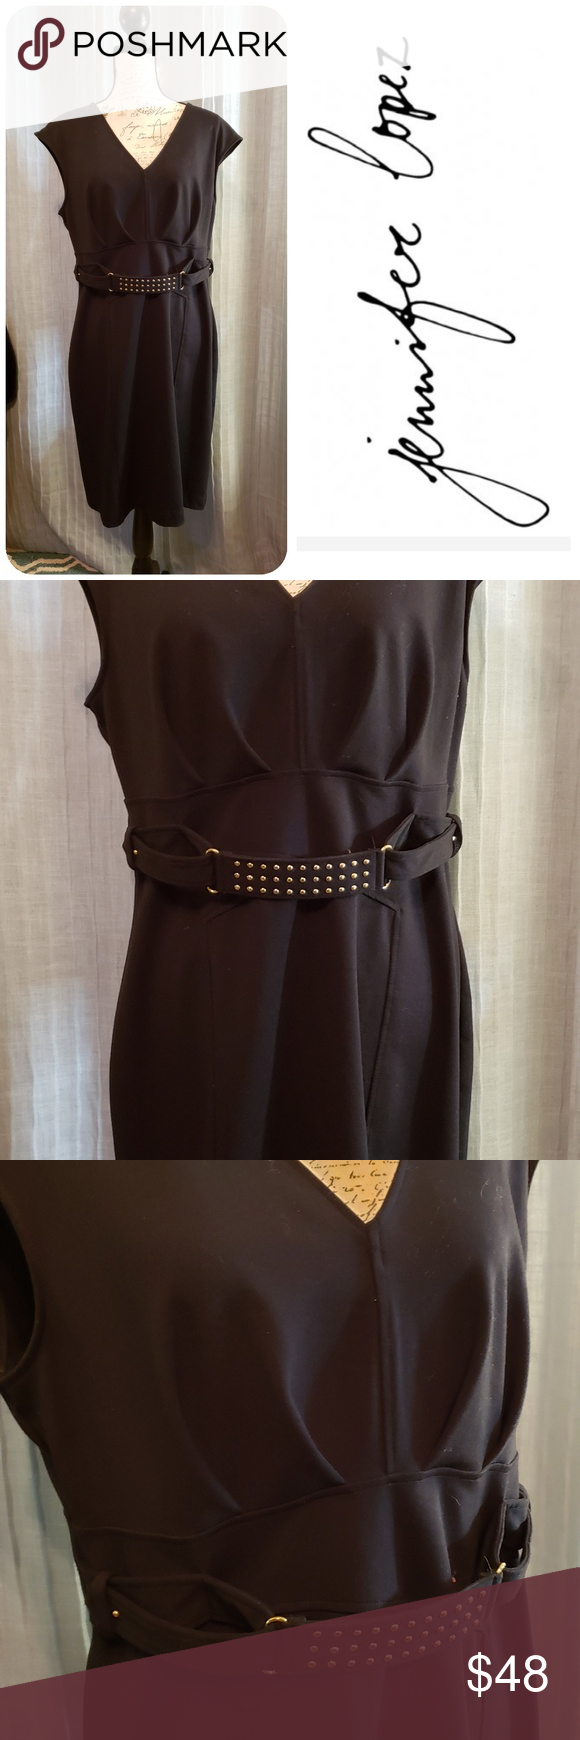 Jennifer Lopez Black Dress Size 16 Size 16 Dresses Dresses Black Dress [ 1740 x 580 Pixel ]